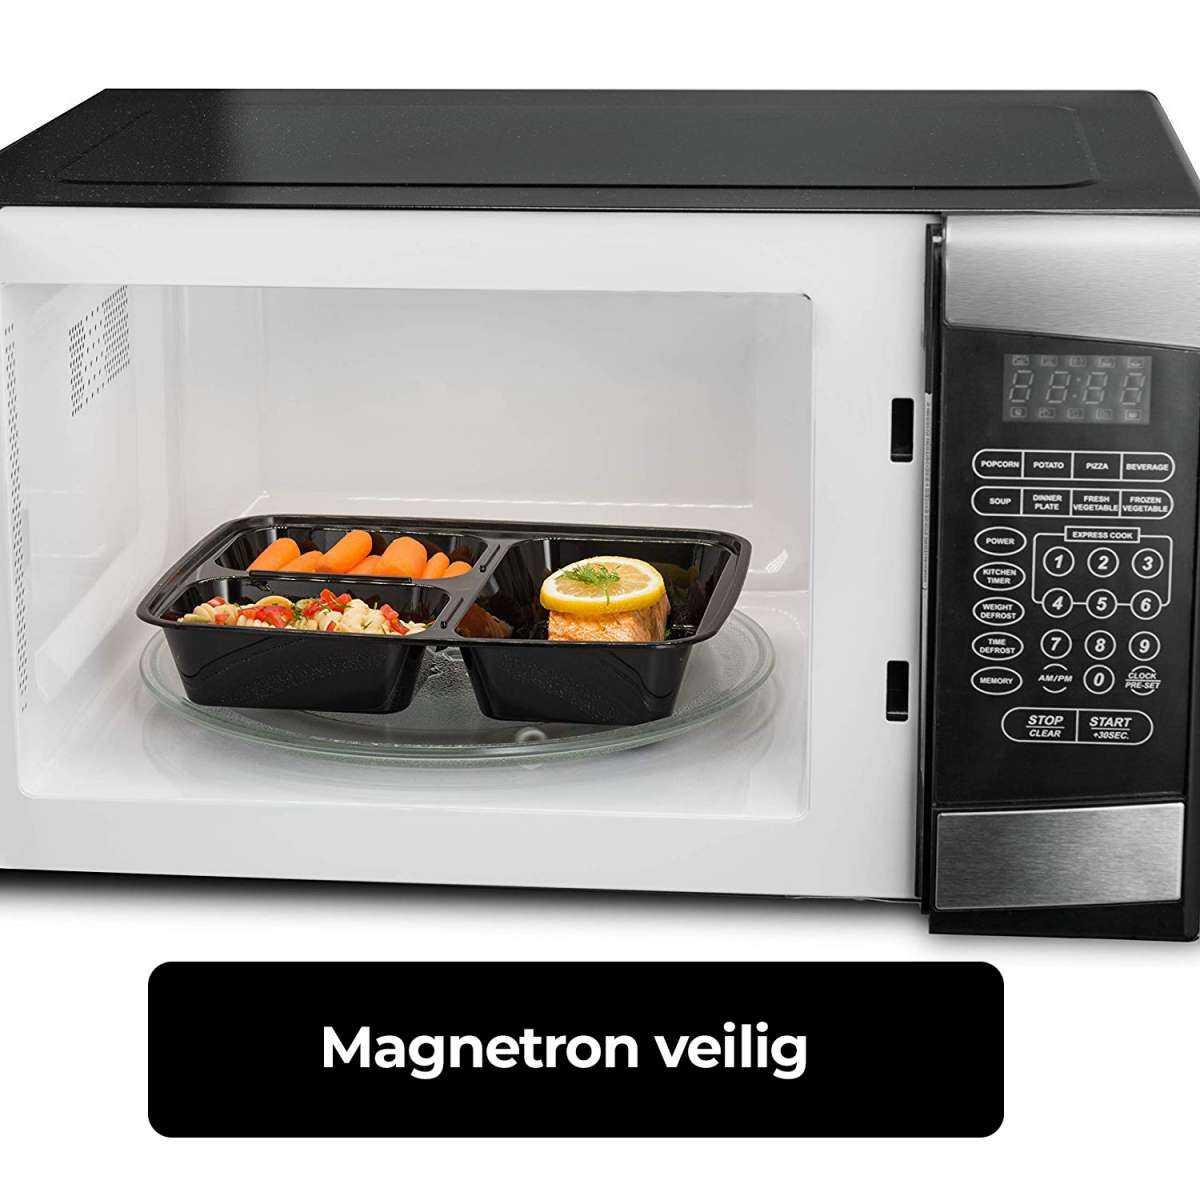 Magnetron veilig